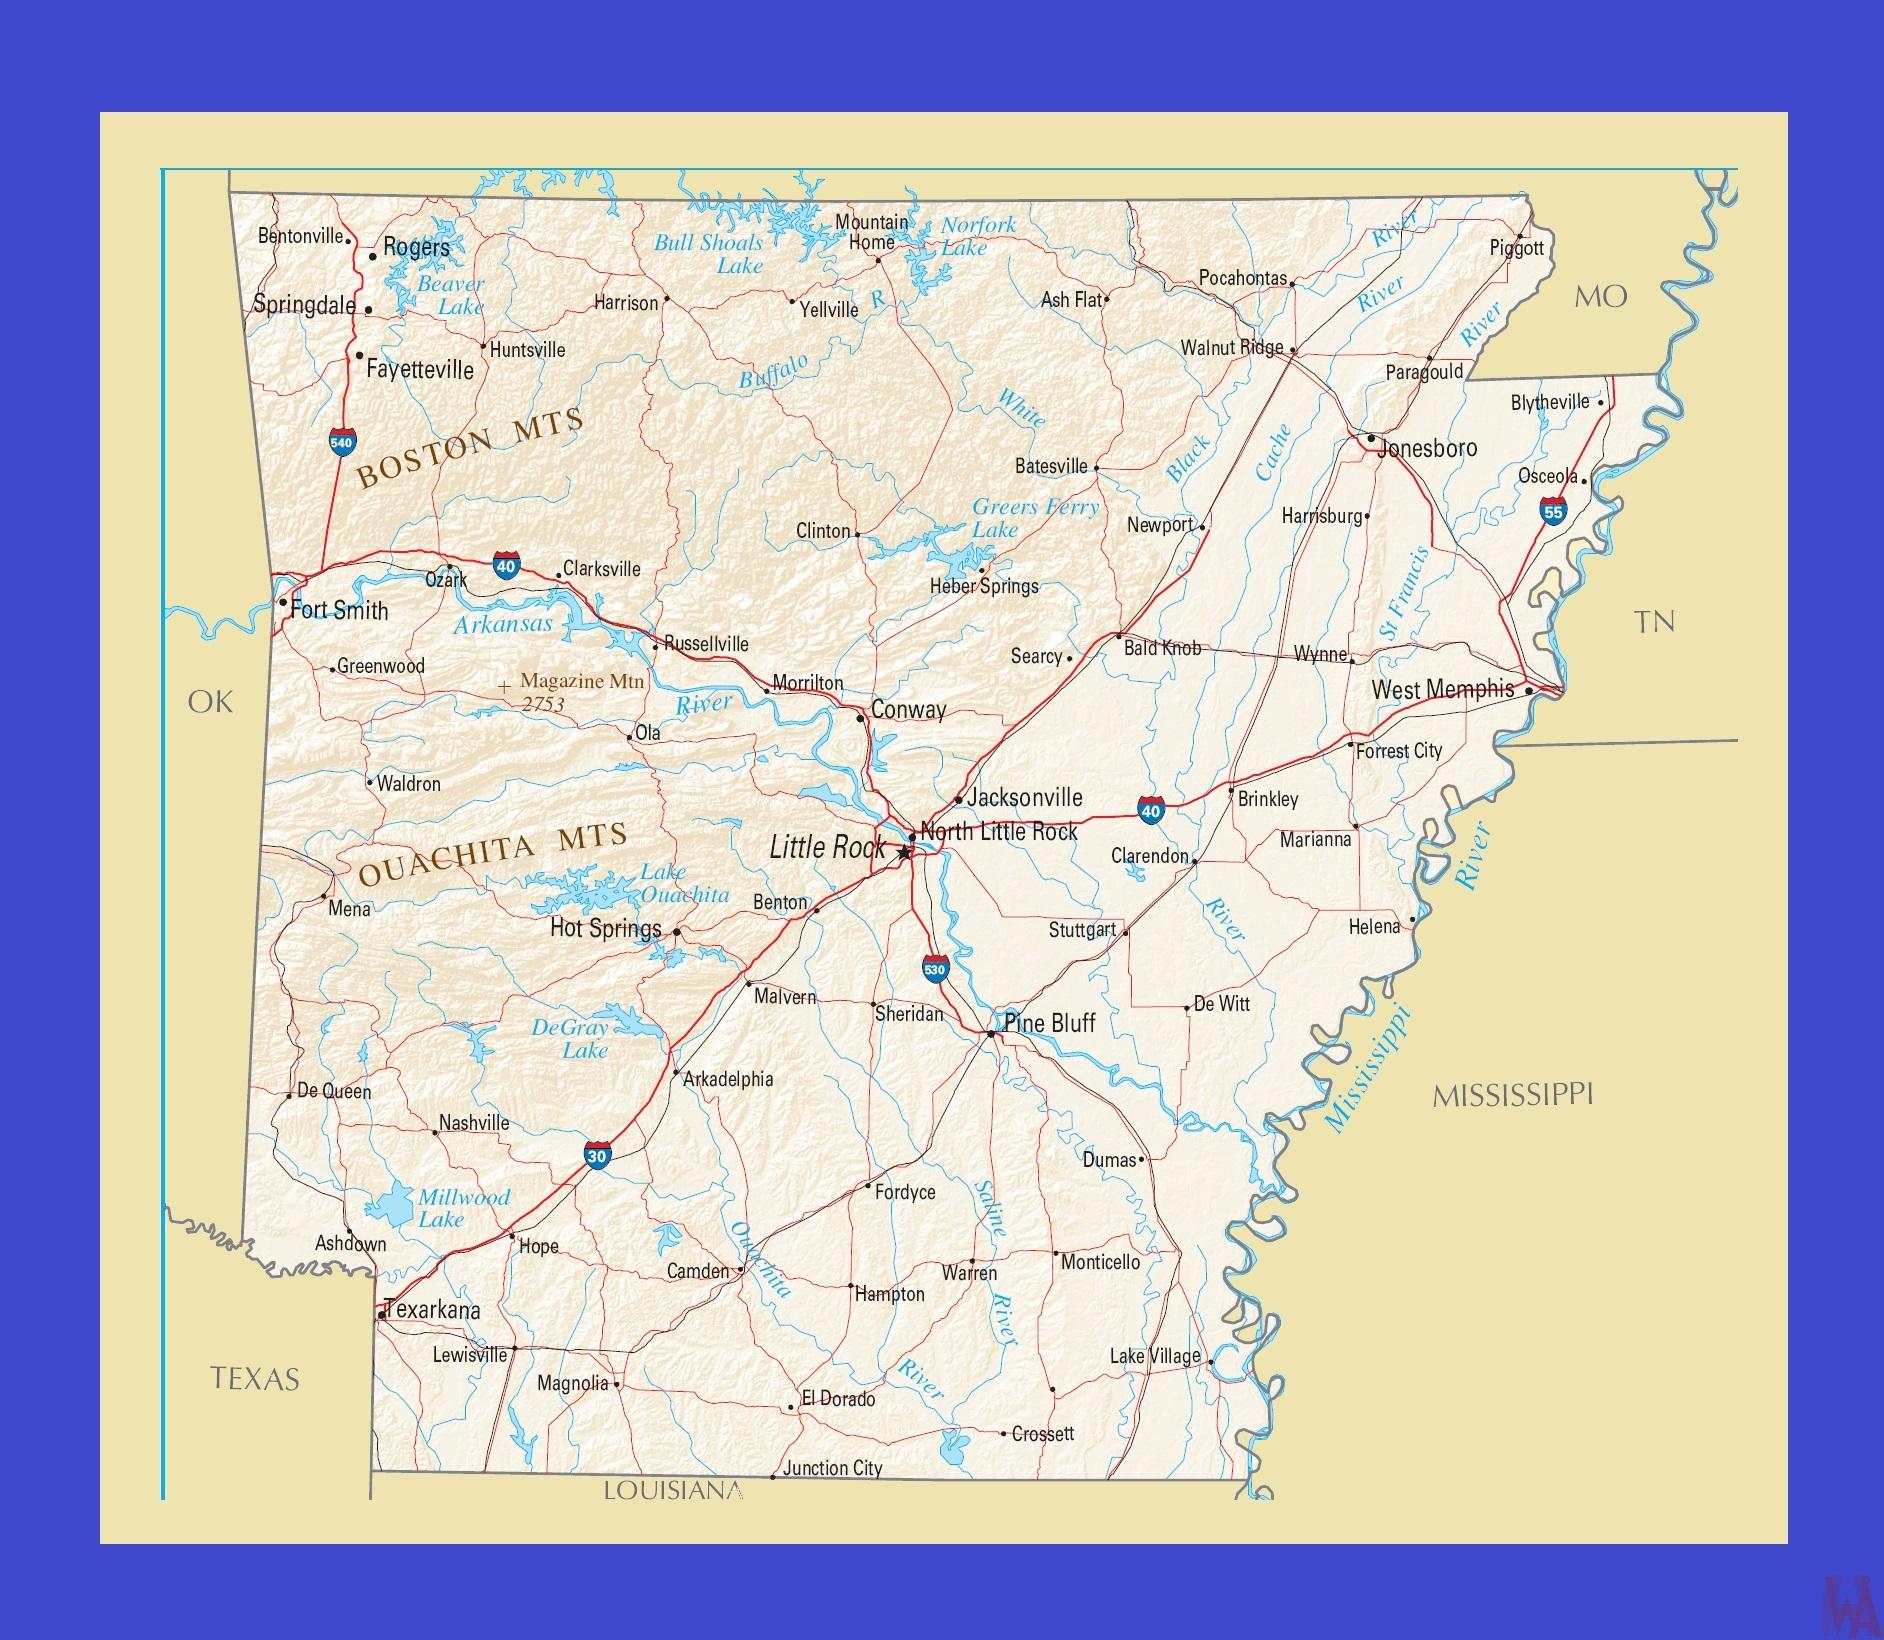 Arkansas Political Map | Political Map of Arkansas | WhatsAnswer on map of connecticut, harrison arkansas, map of idaho, texarkana arkansas, map of north carolina, rivers in arkansas, map of georgia, map of michigan, map of texas, osceola arkansas, map of new jersey, map of ohio, russellville arkansas, ash flat arkansas, map of alabama, map of colorado, google maps arkansas, piggott arkansas, murfreesboro arkansas, fairfield bay arkansas, jonesboro arkansas, map of africa, dewitt arkansas, ozark arkansas, fort smith arkansas, map of hawaii, map of new york, map of alaska, map of illinois, white river arkansas, england arkansas, map of florida, cities in arkansas, helena arkansas, map of arizona, map of virginia, map of delaware, waldron arkansas, west memphis arkansas,